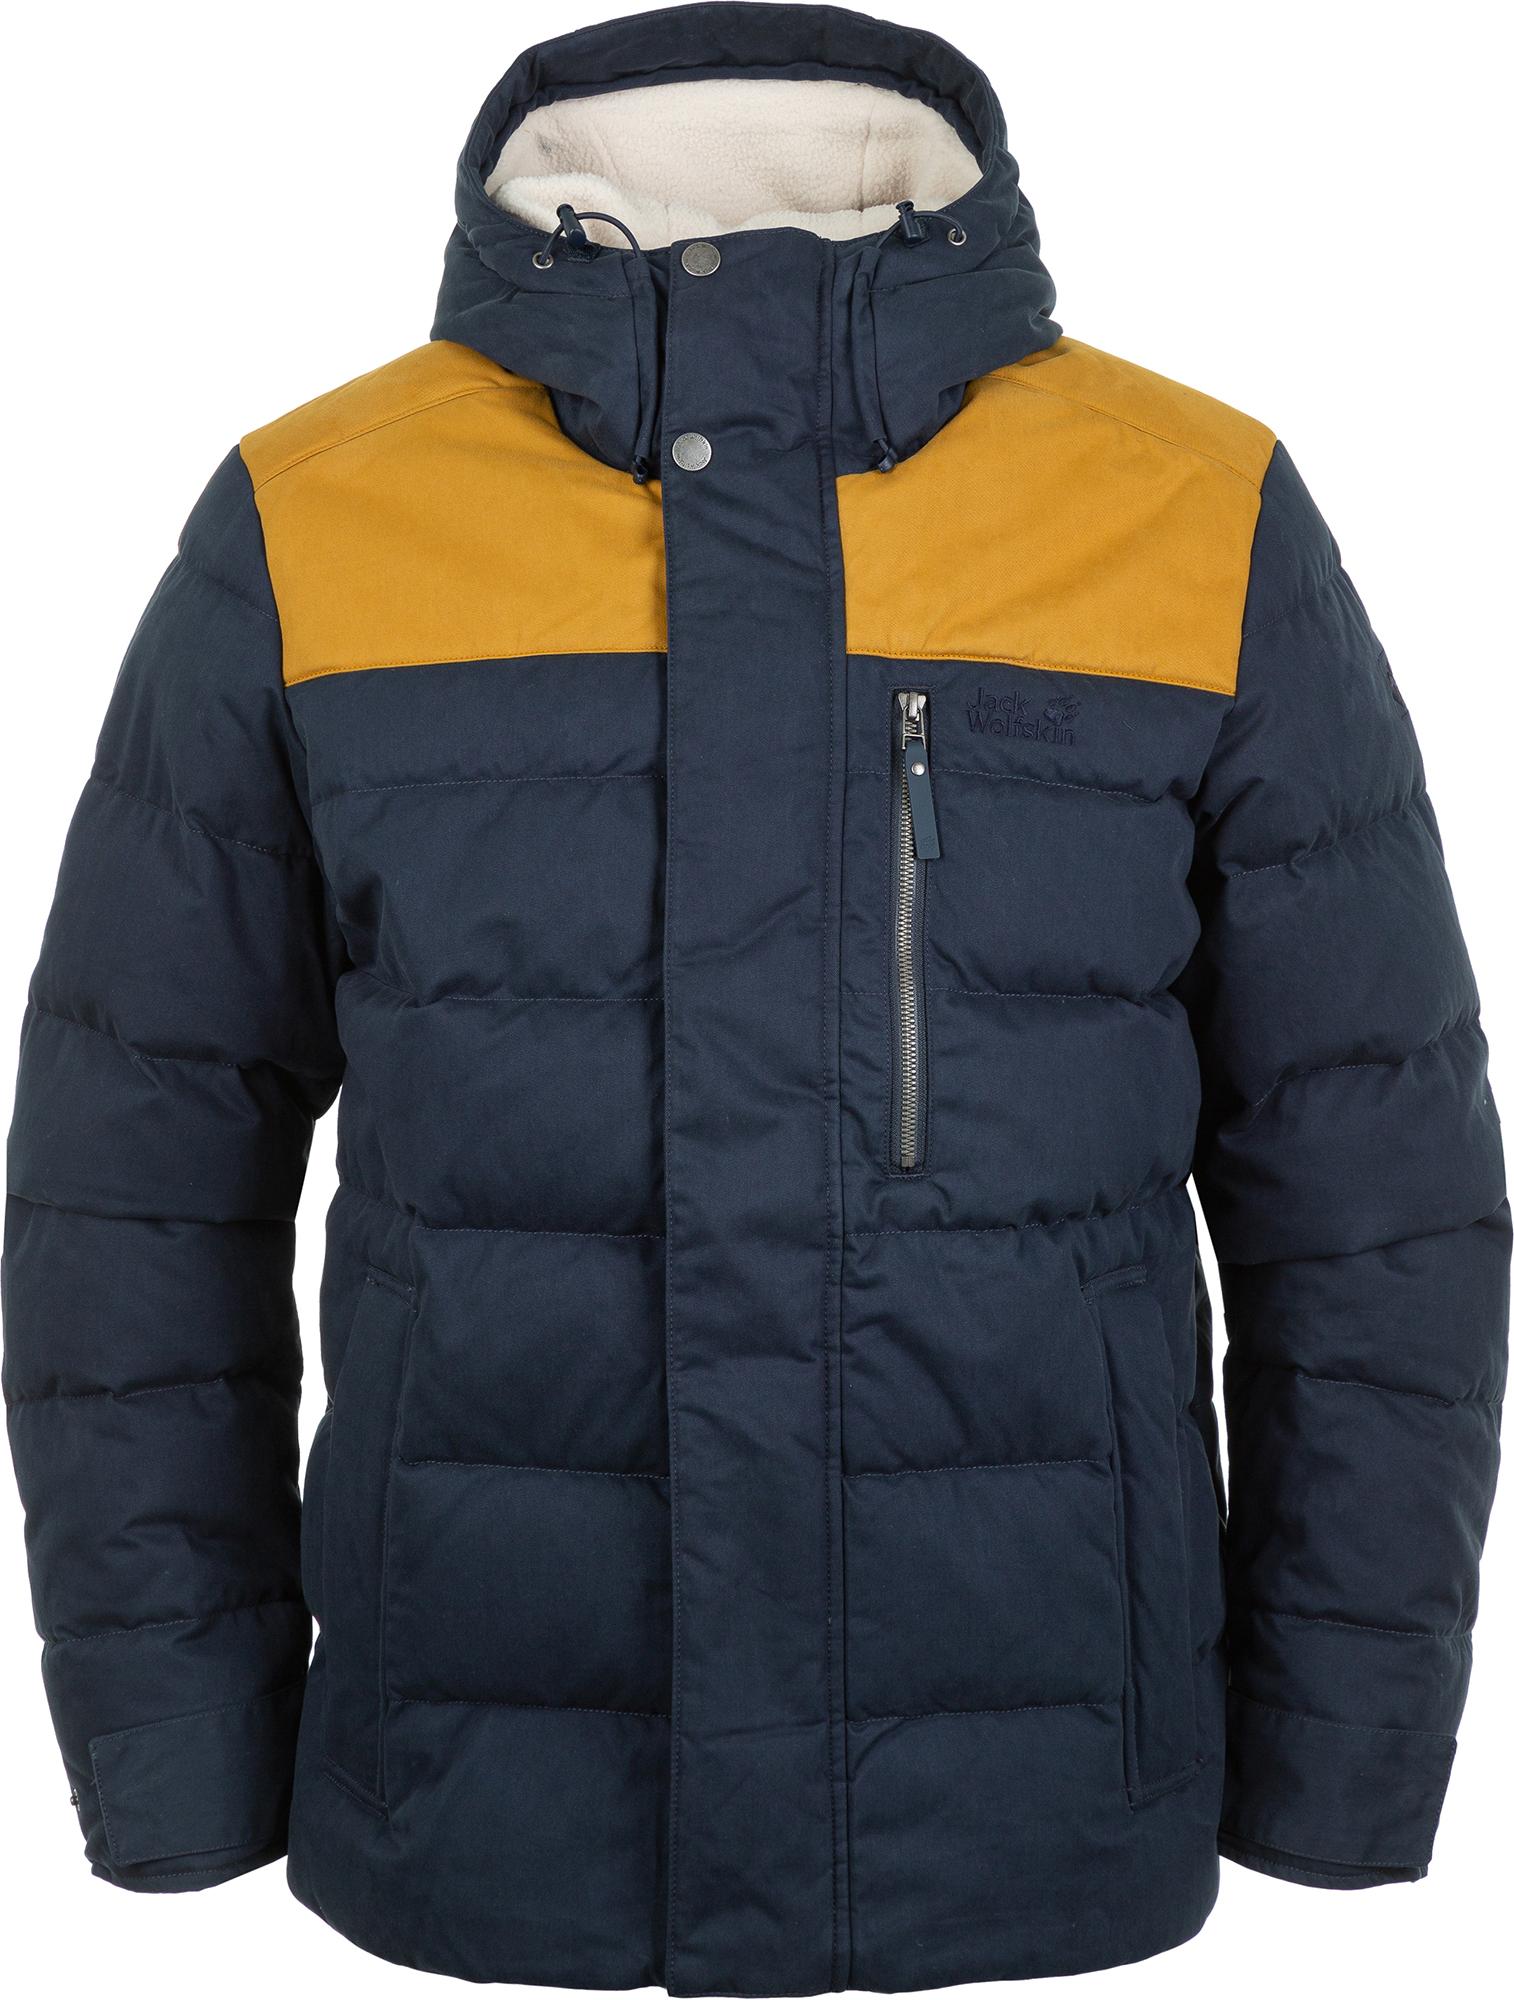 Jack Wolfskin Куртка пуховая мужская Jack Wolfskin Lakota, размер 58